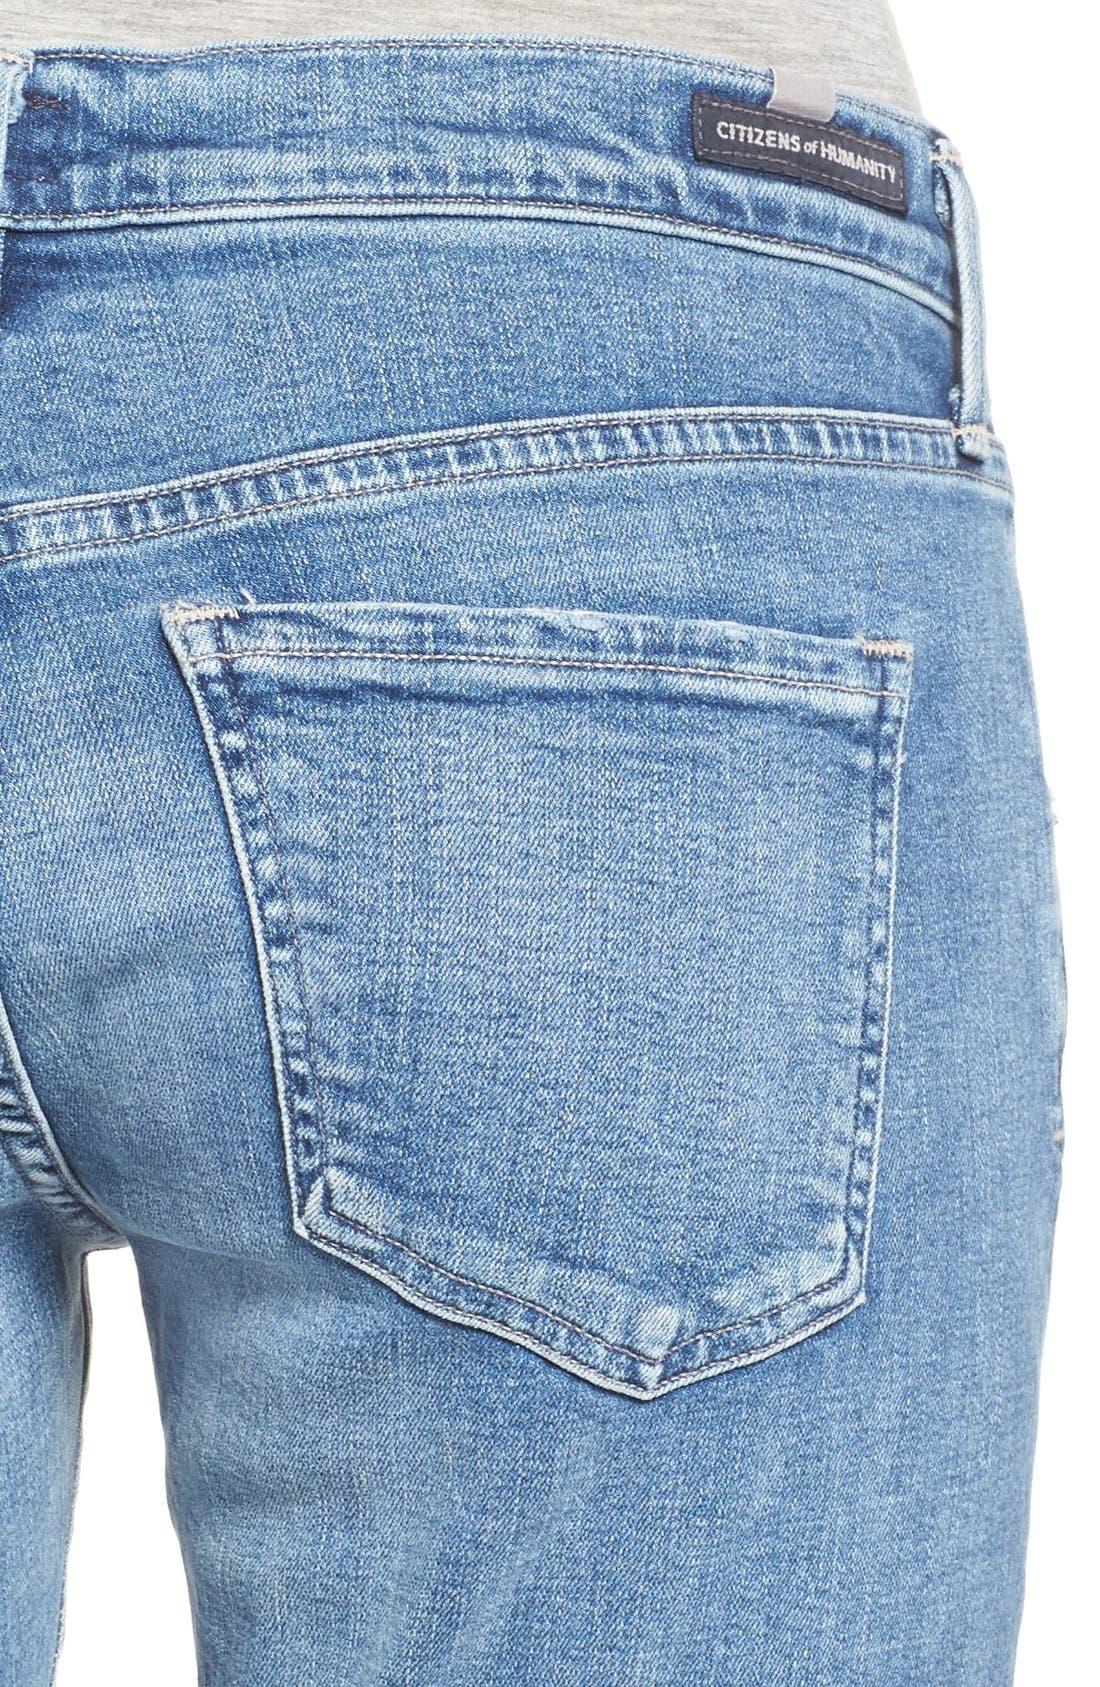 Emerson Slim Boyfriend Jeans,                             Alternate thumbnail 4, color,                             Pacifica